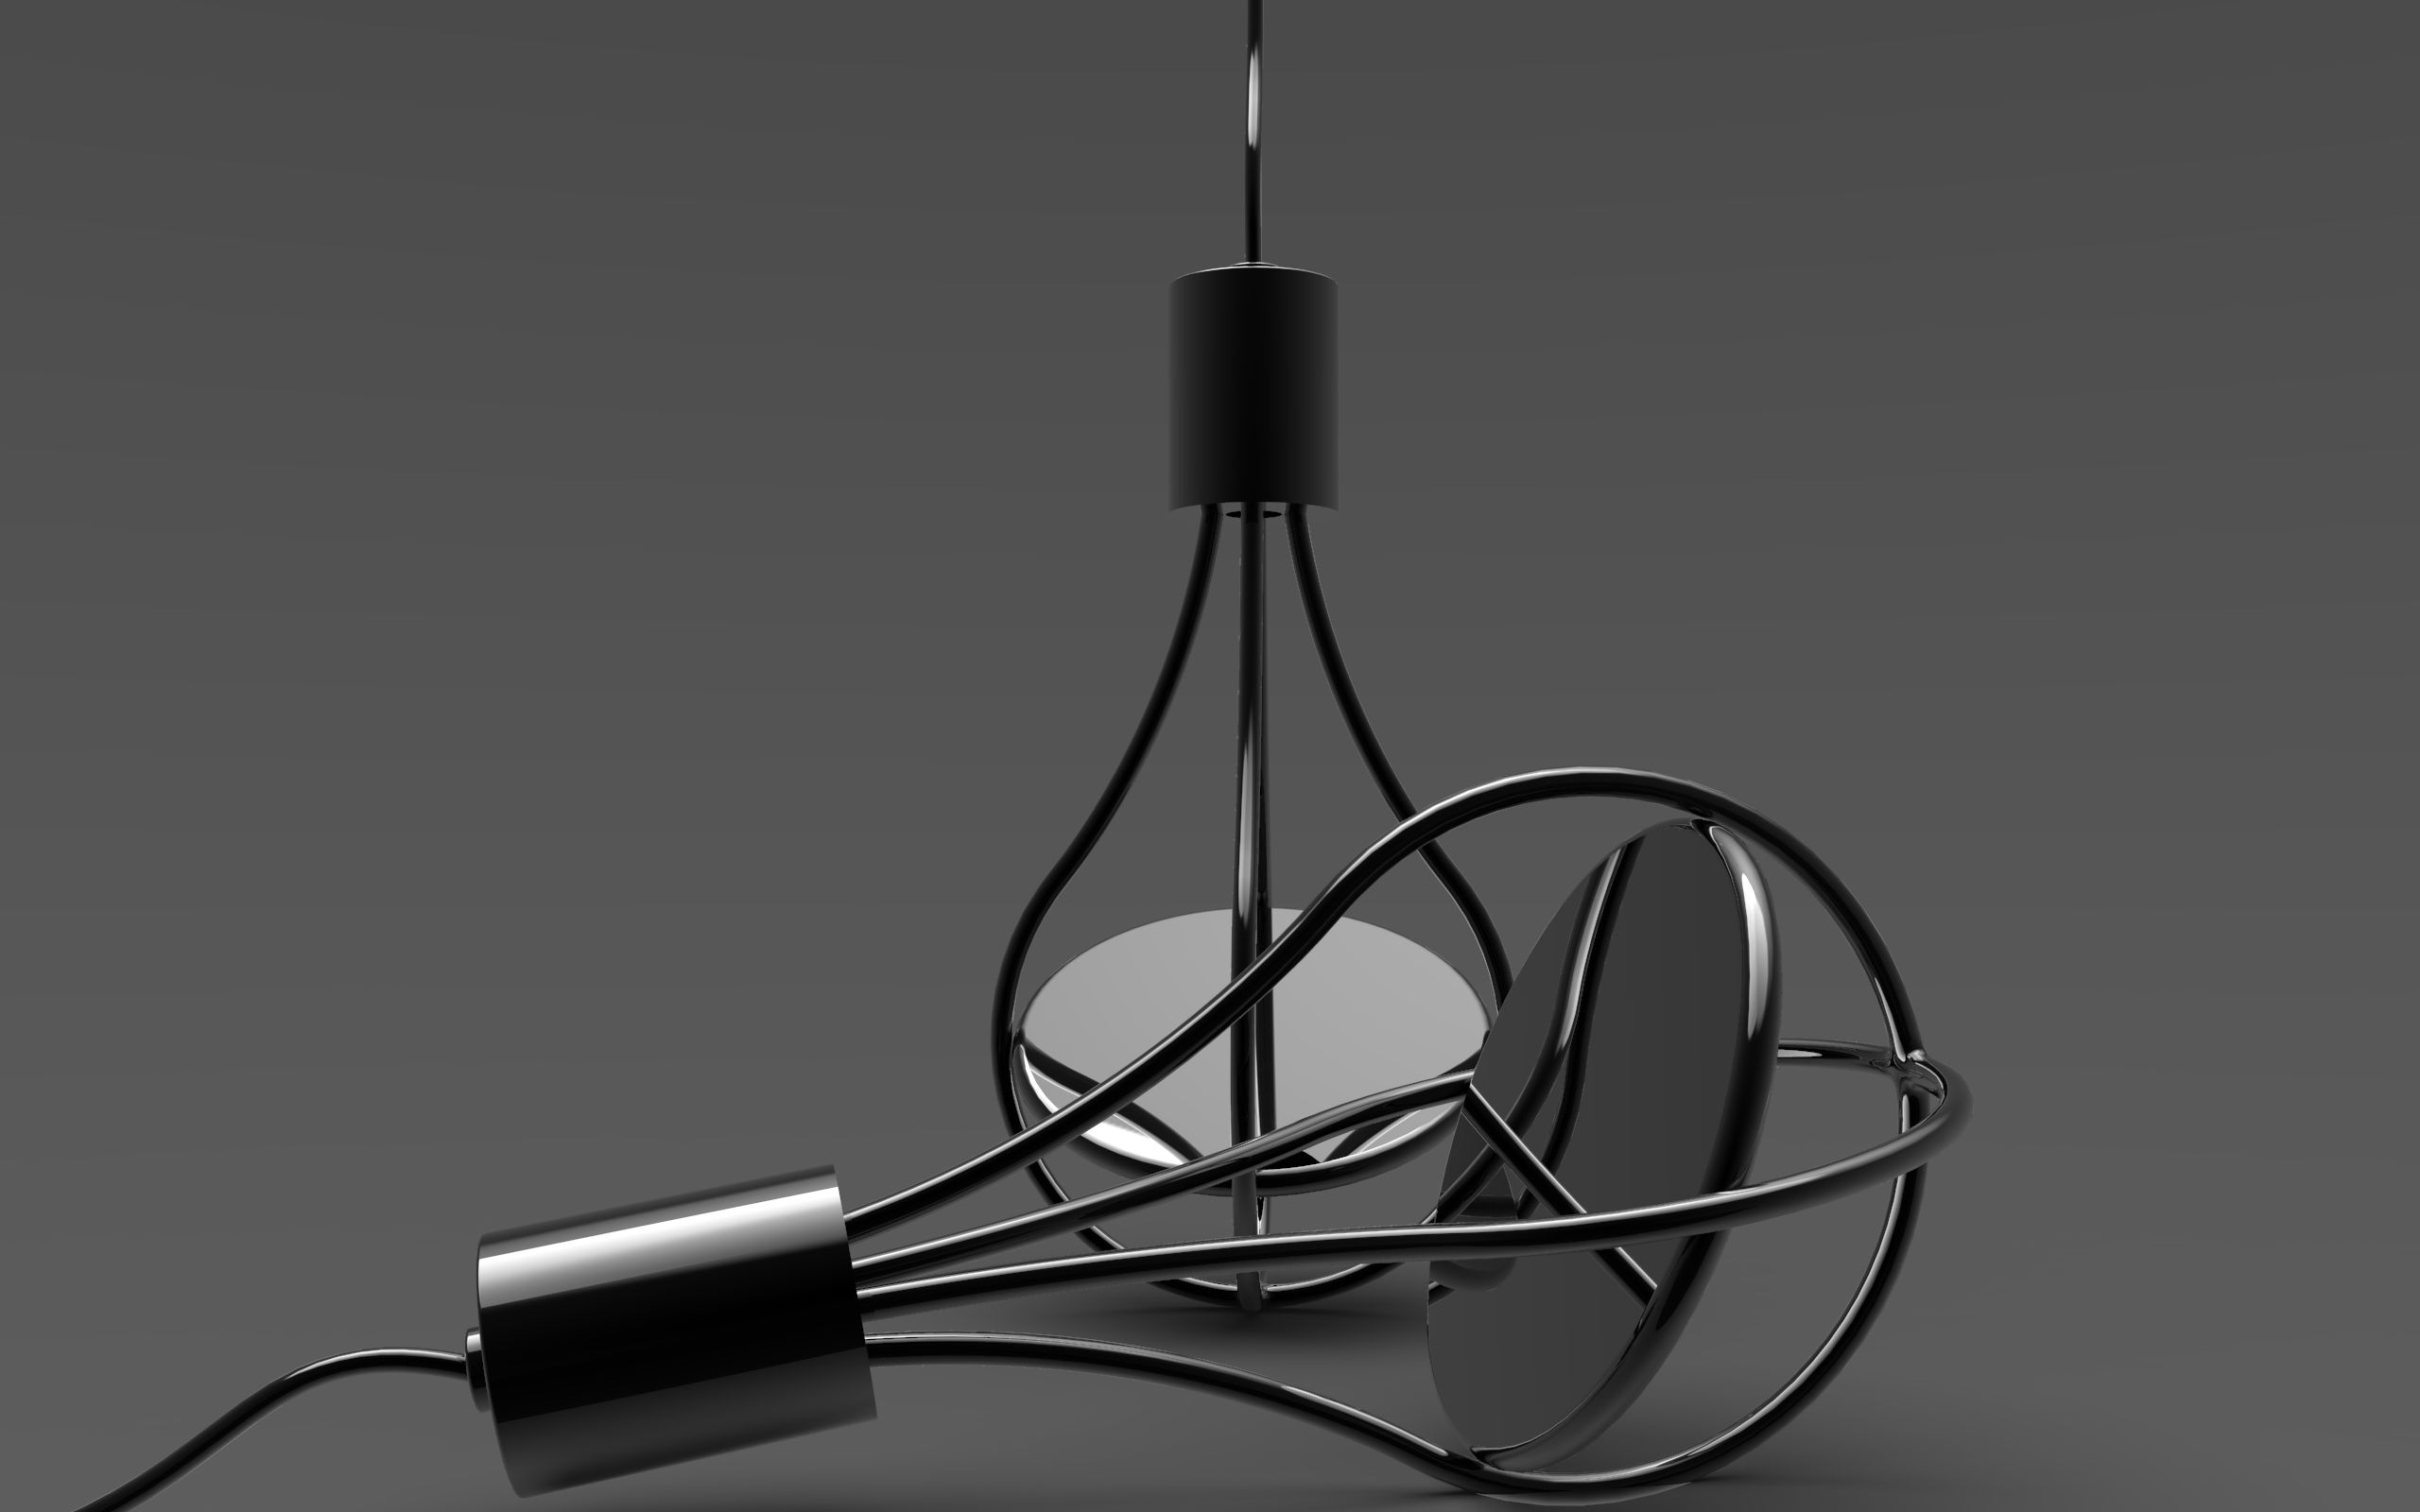 Lamp-l10f-pro10-3500-3500